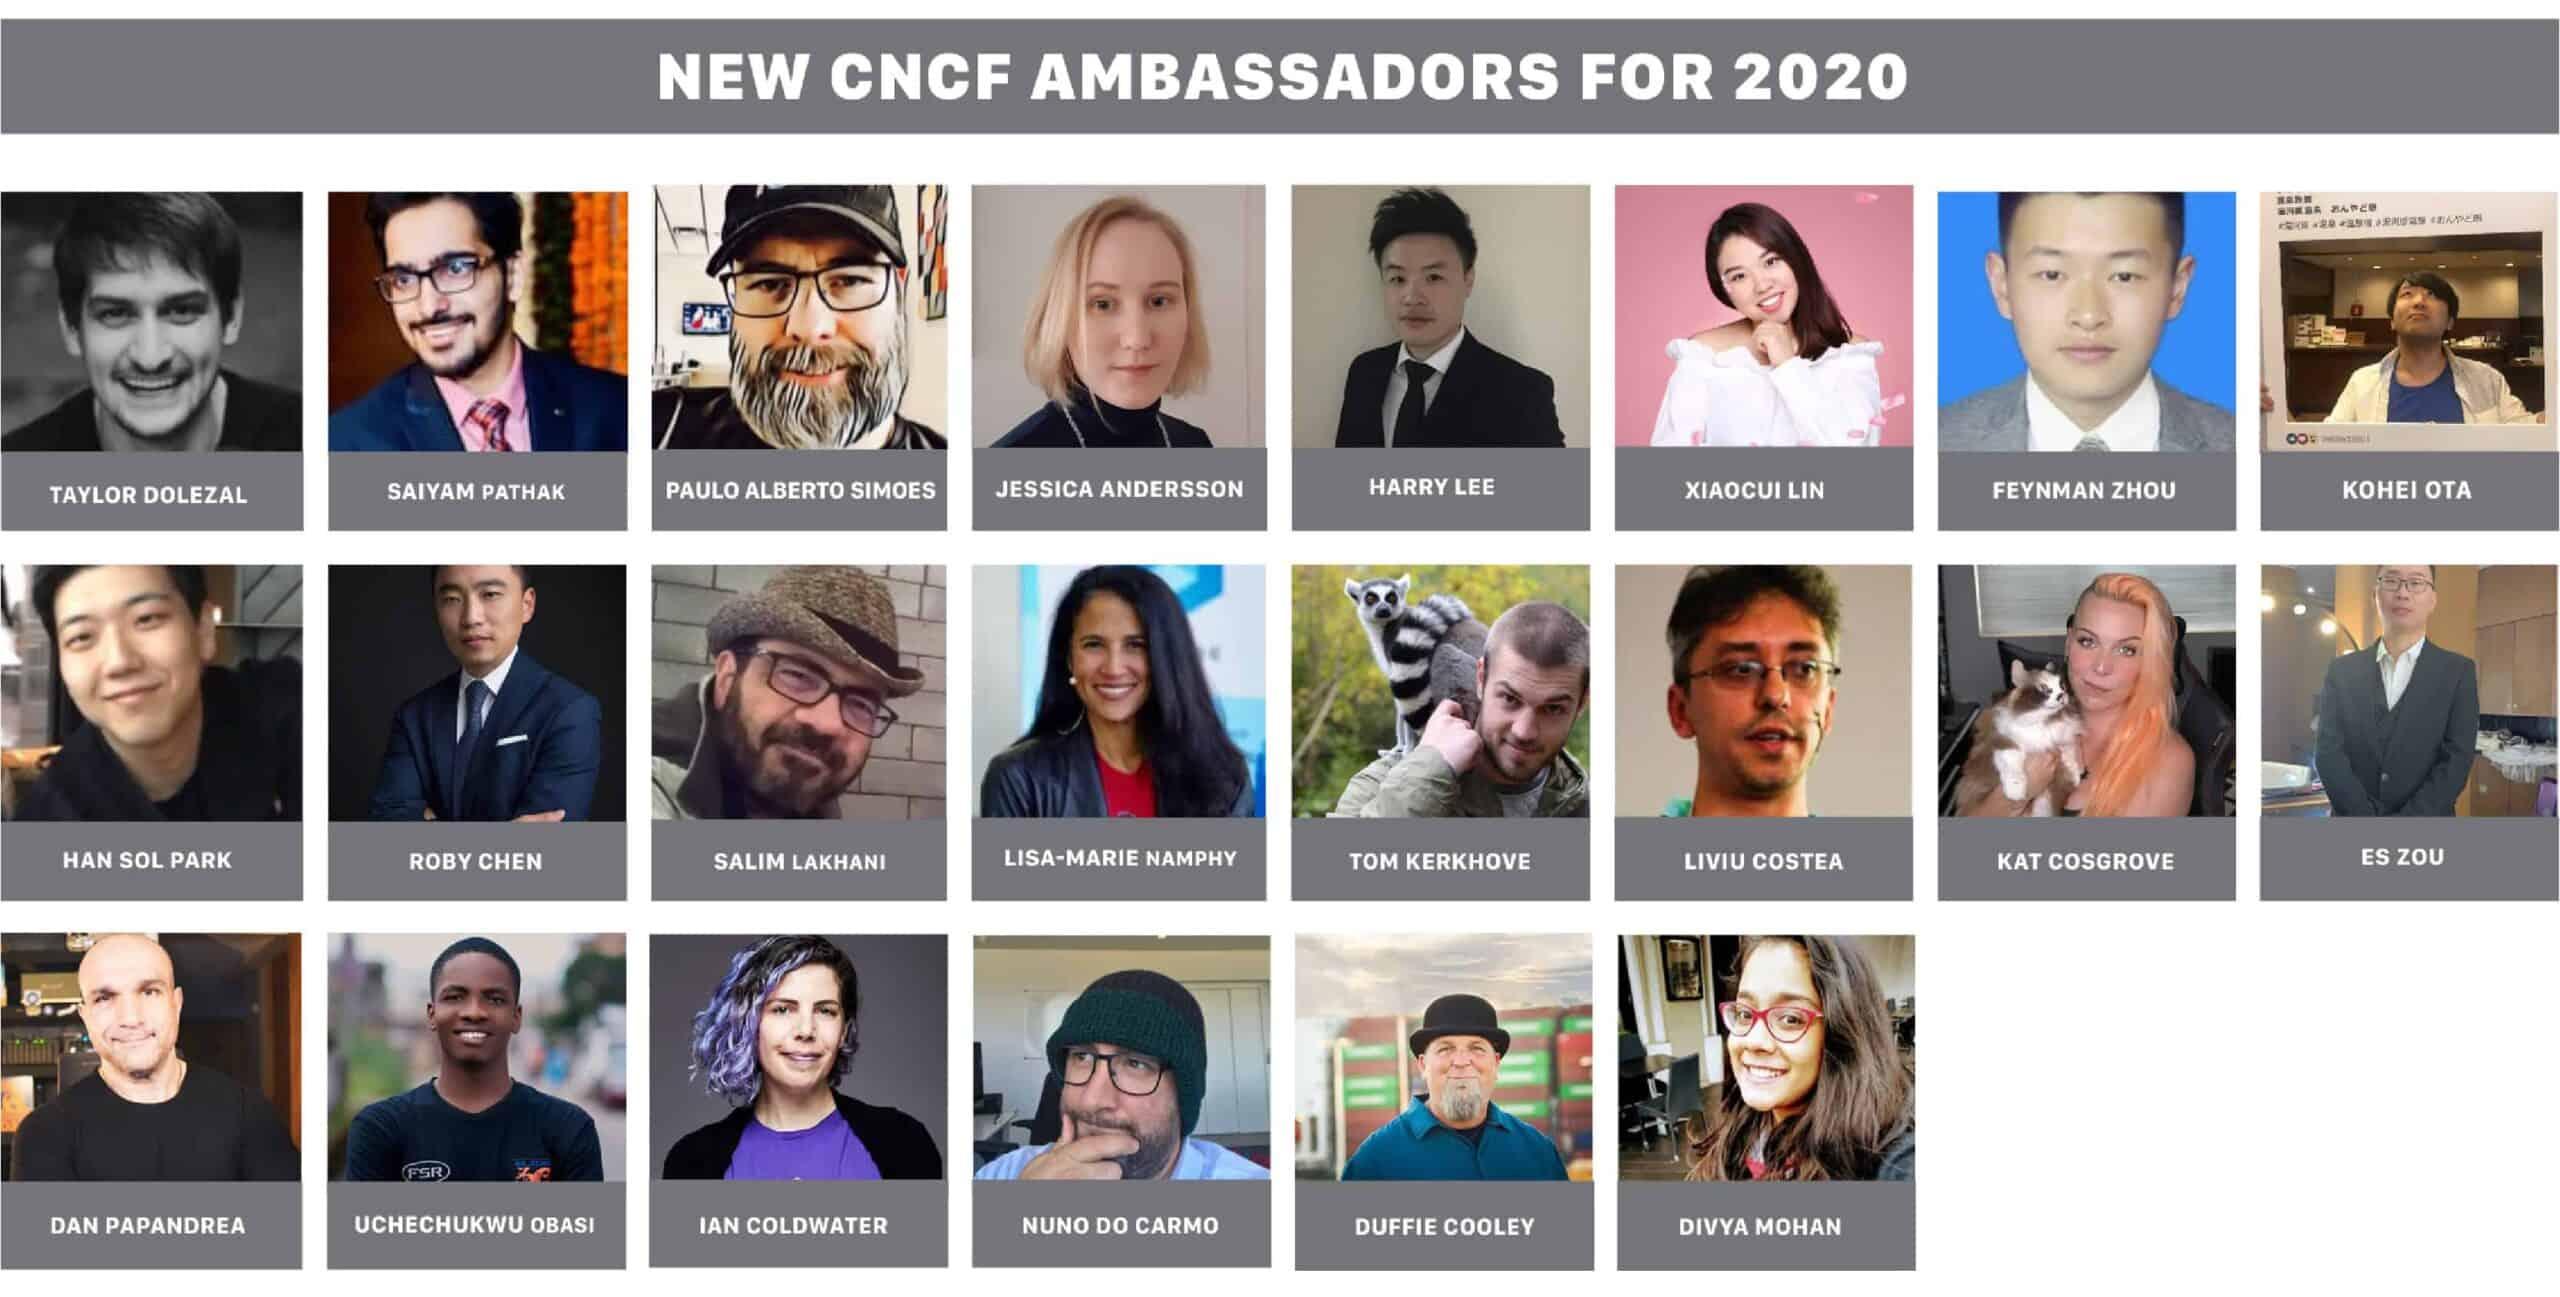 New ambassadors for 2020